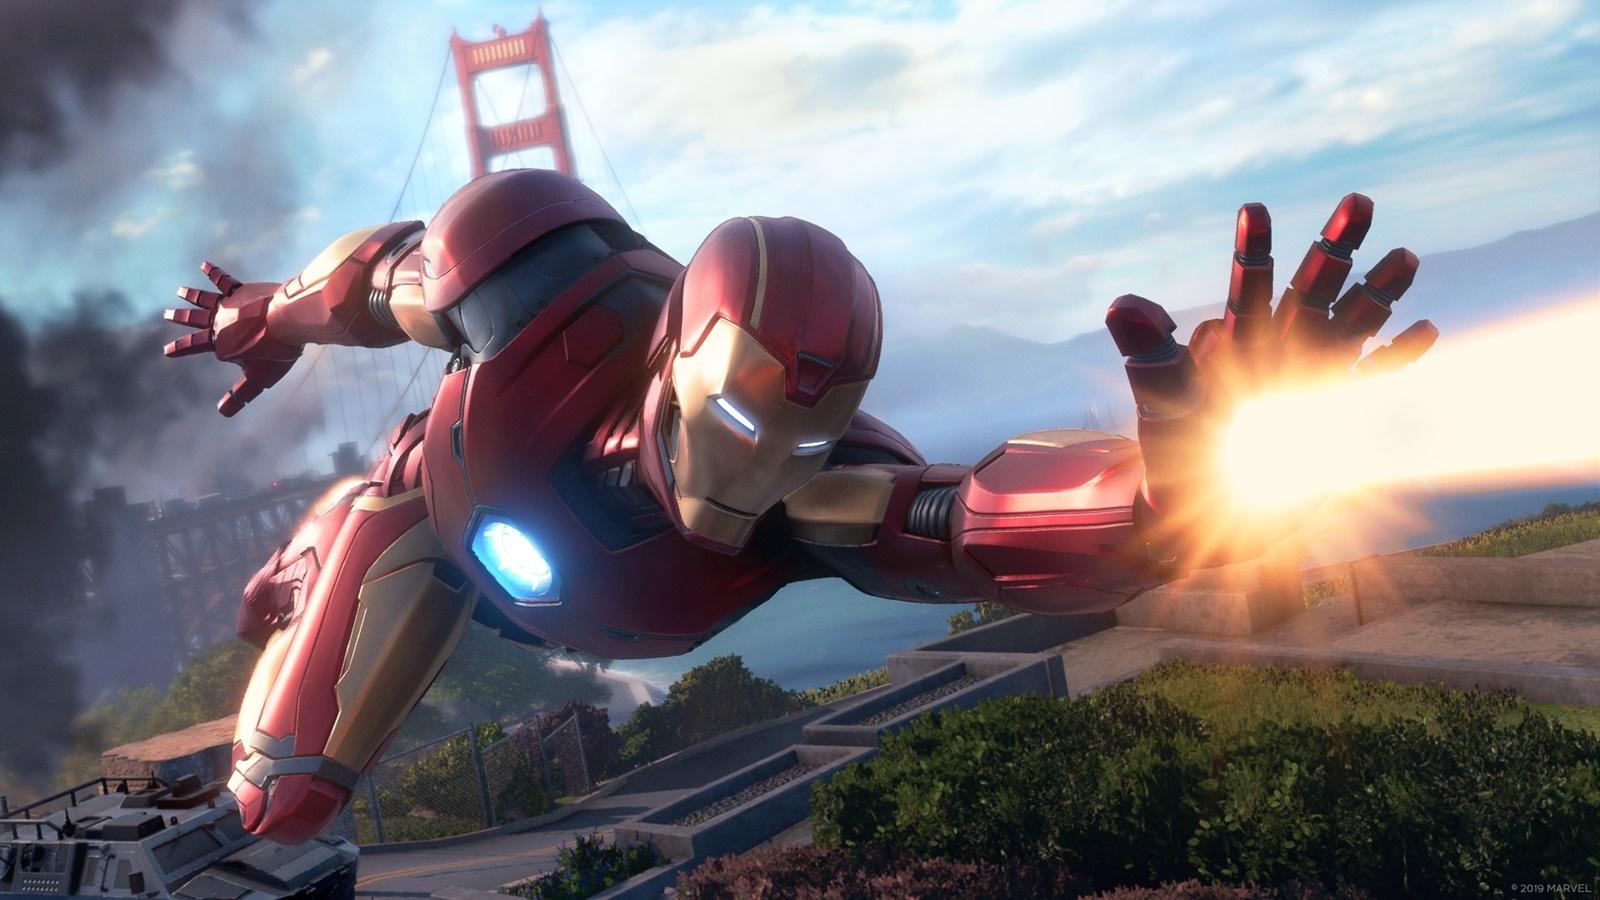 <b>(한글)마 어벤저스 Avengers 히어로 액션 최강퀄리티</b>